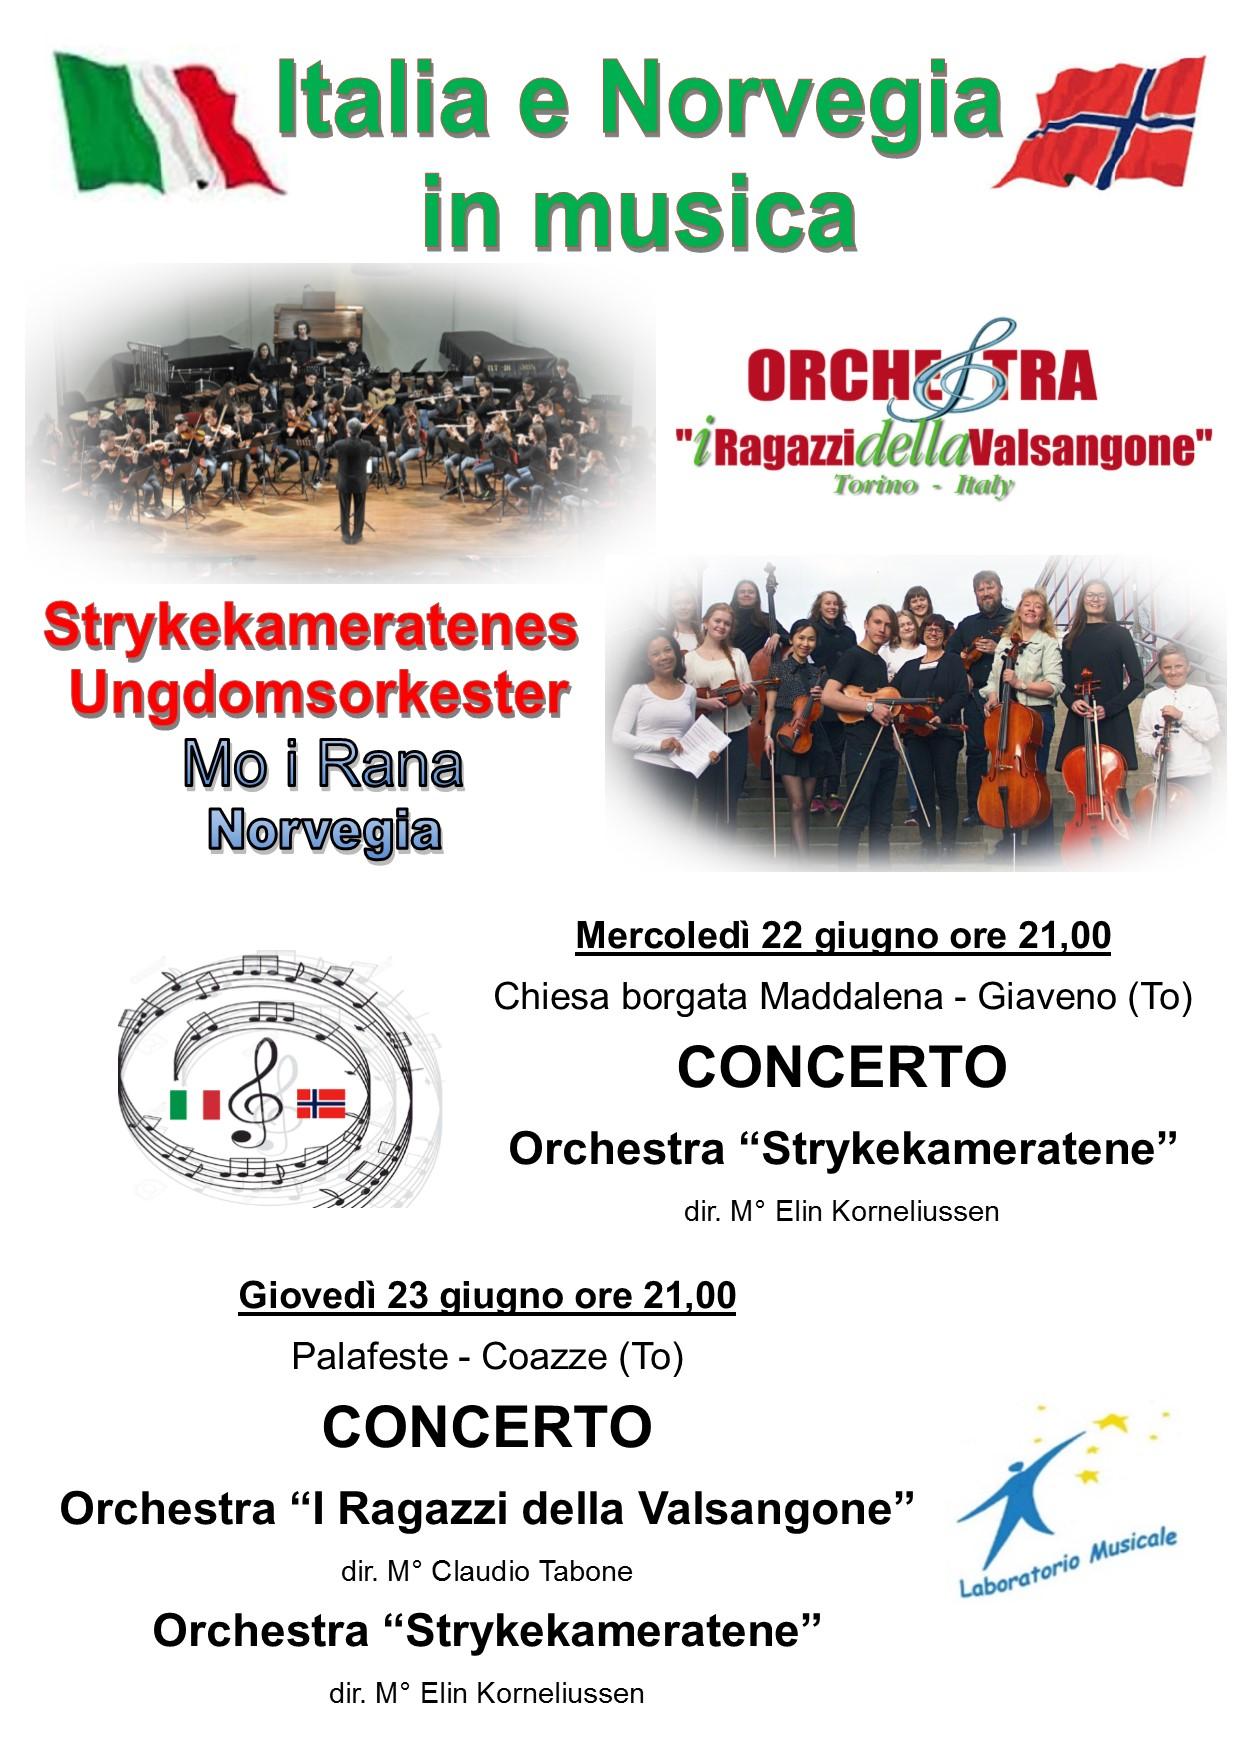 Italia e Norvegia in Musica